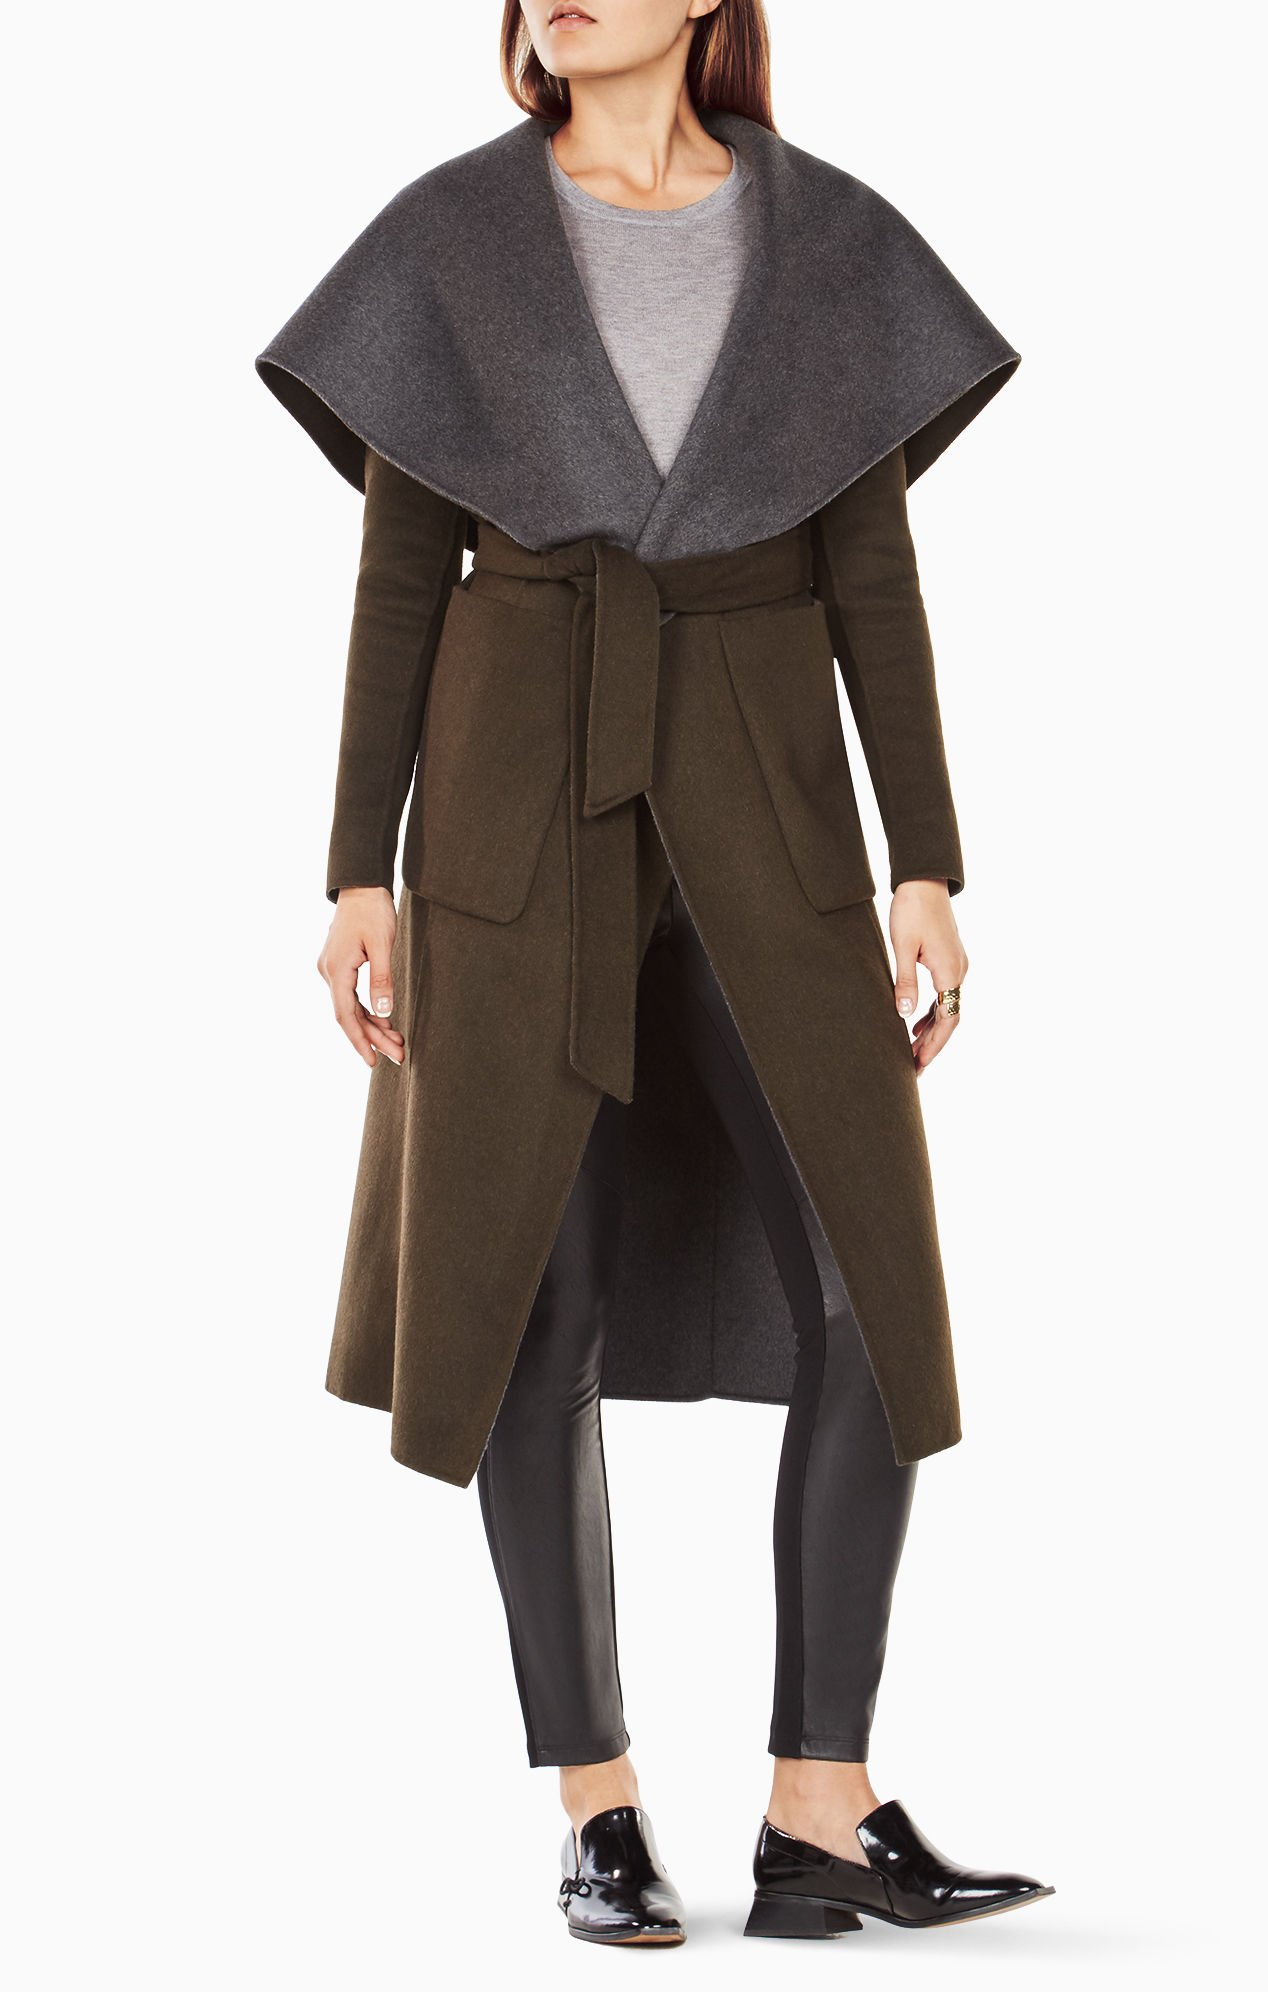 BCBGMaxazria Chandler Olive Green Long Wool Hooded Coat (XS)